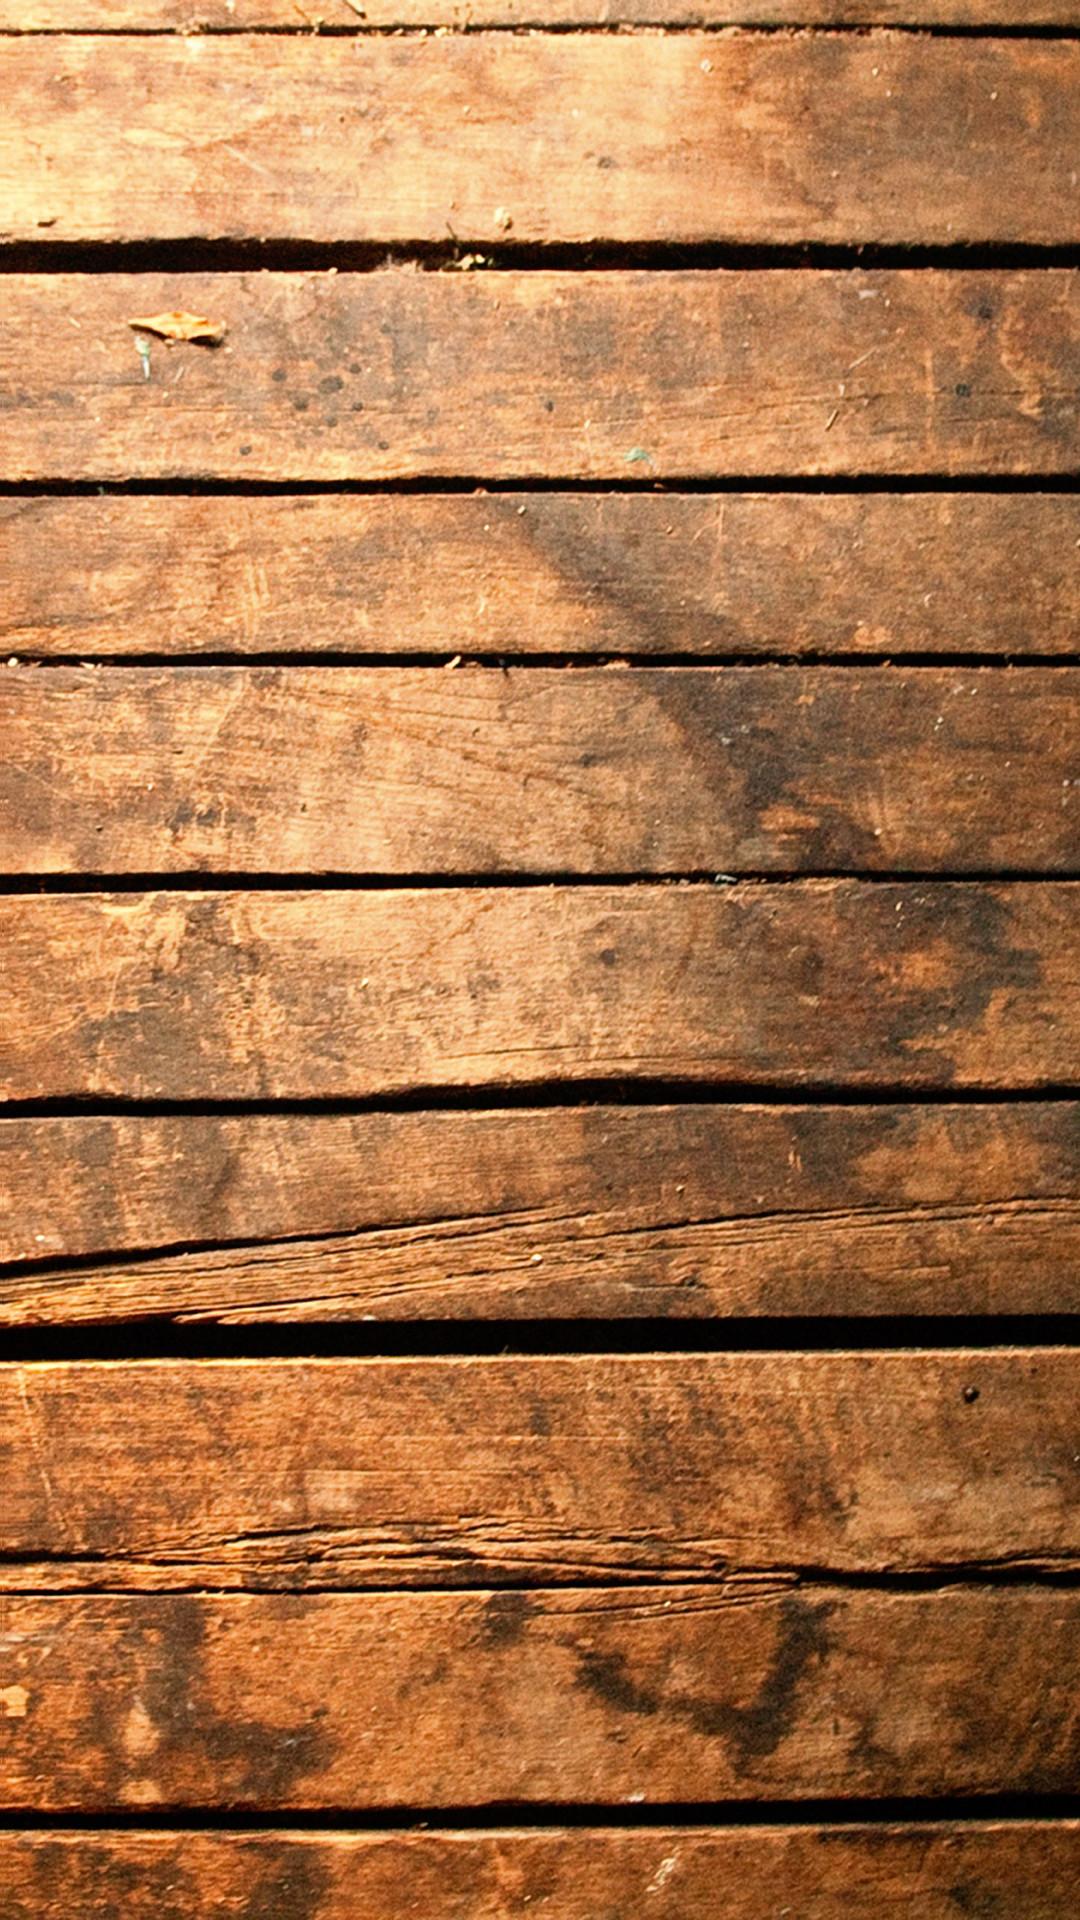 Wood Hd Wallpaper 89 Images